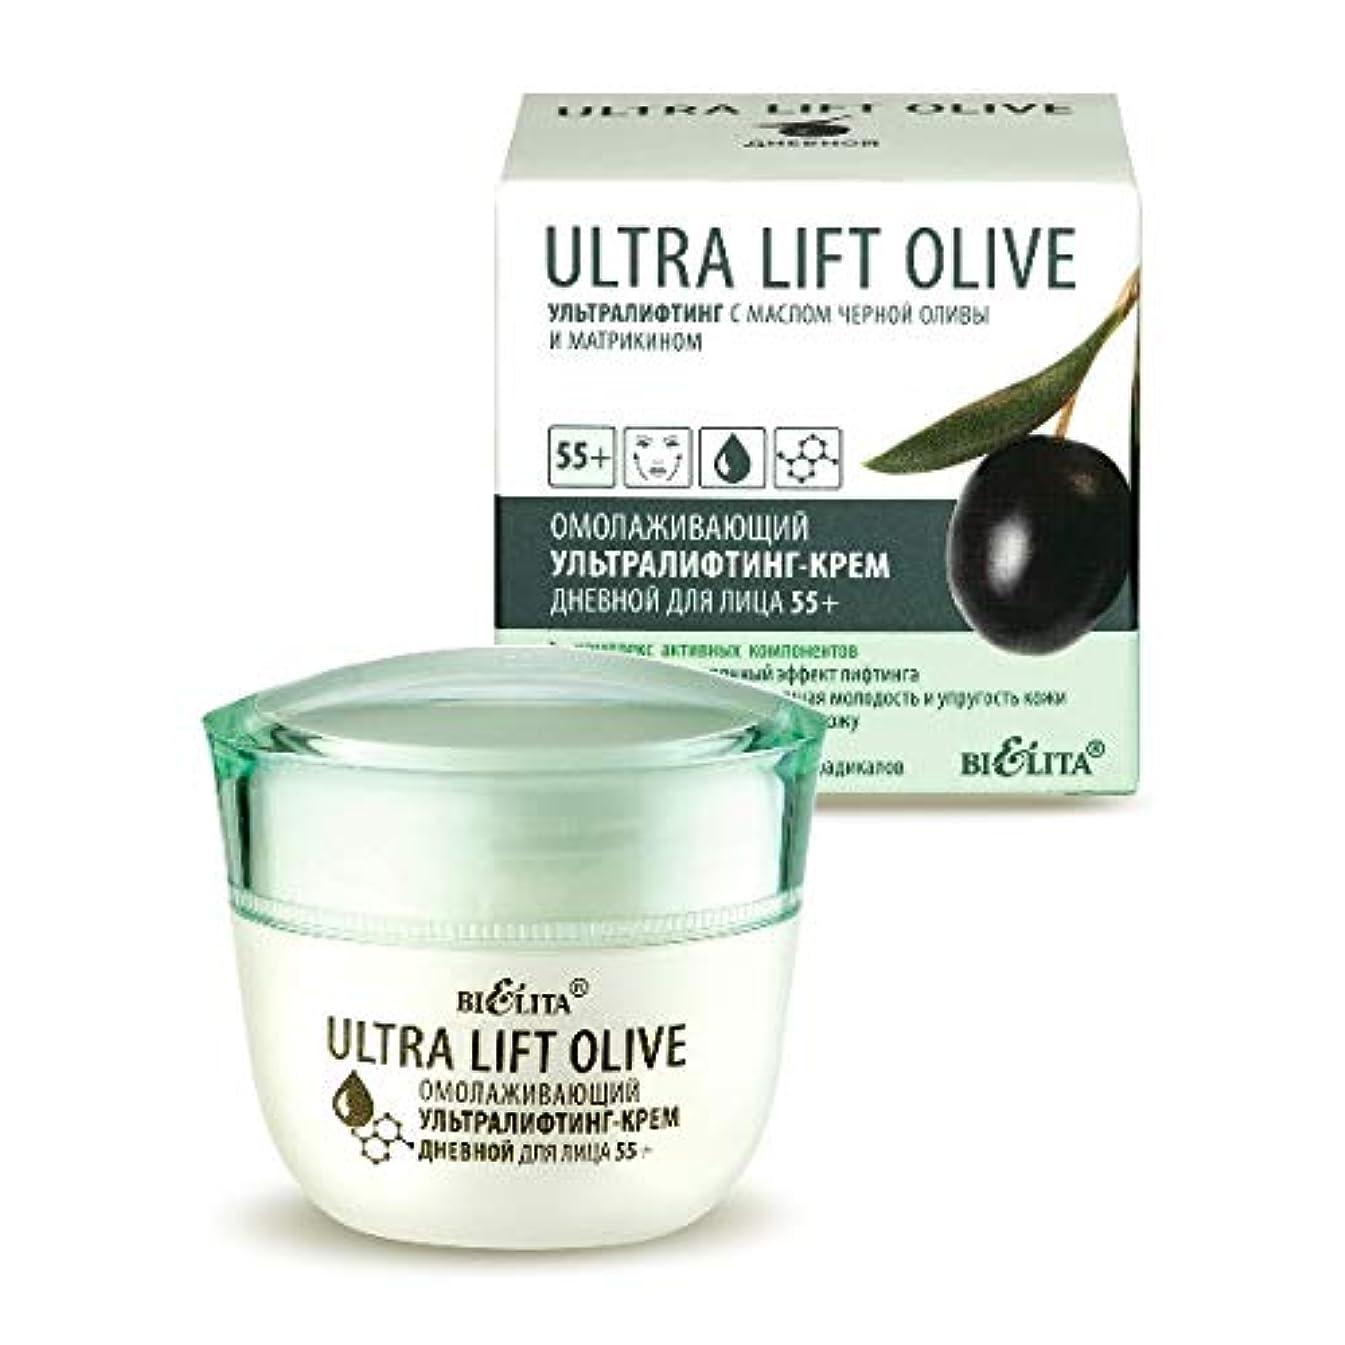 大陸濃度衝動Bielita & Vitex | Ultra lift olive | Face Lift Cream daytime ultralighting-face cream 55+ | reduces wrinkles and...